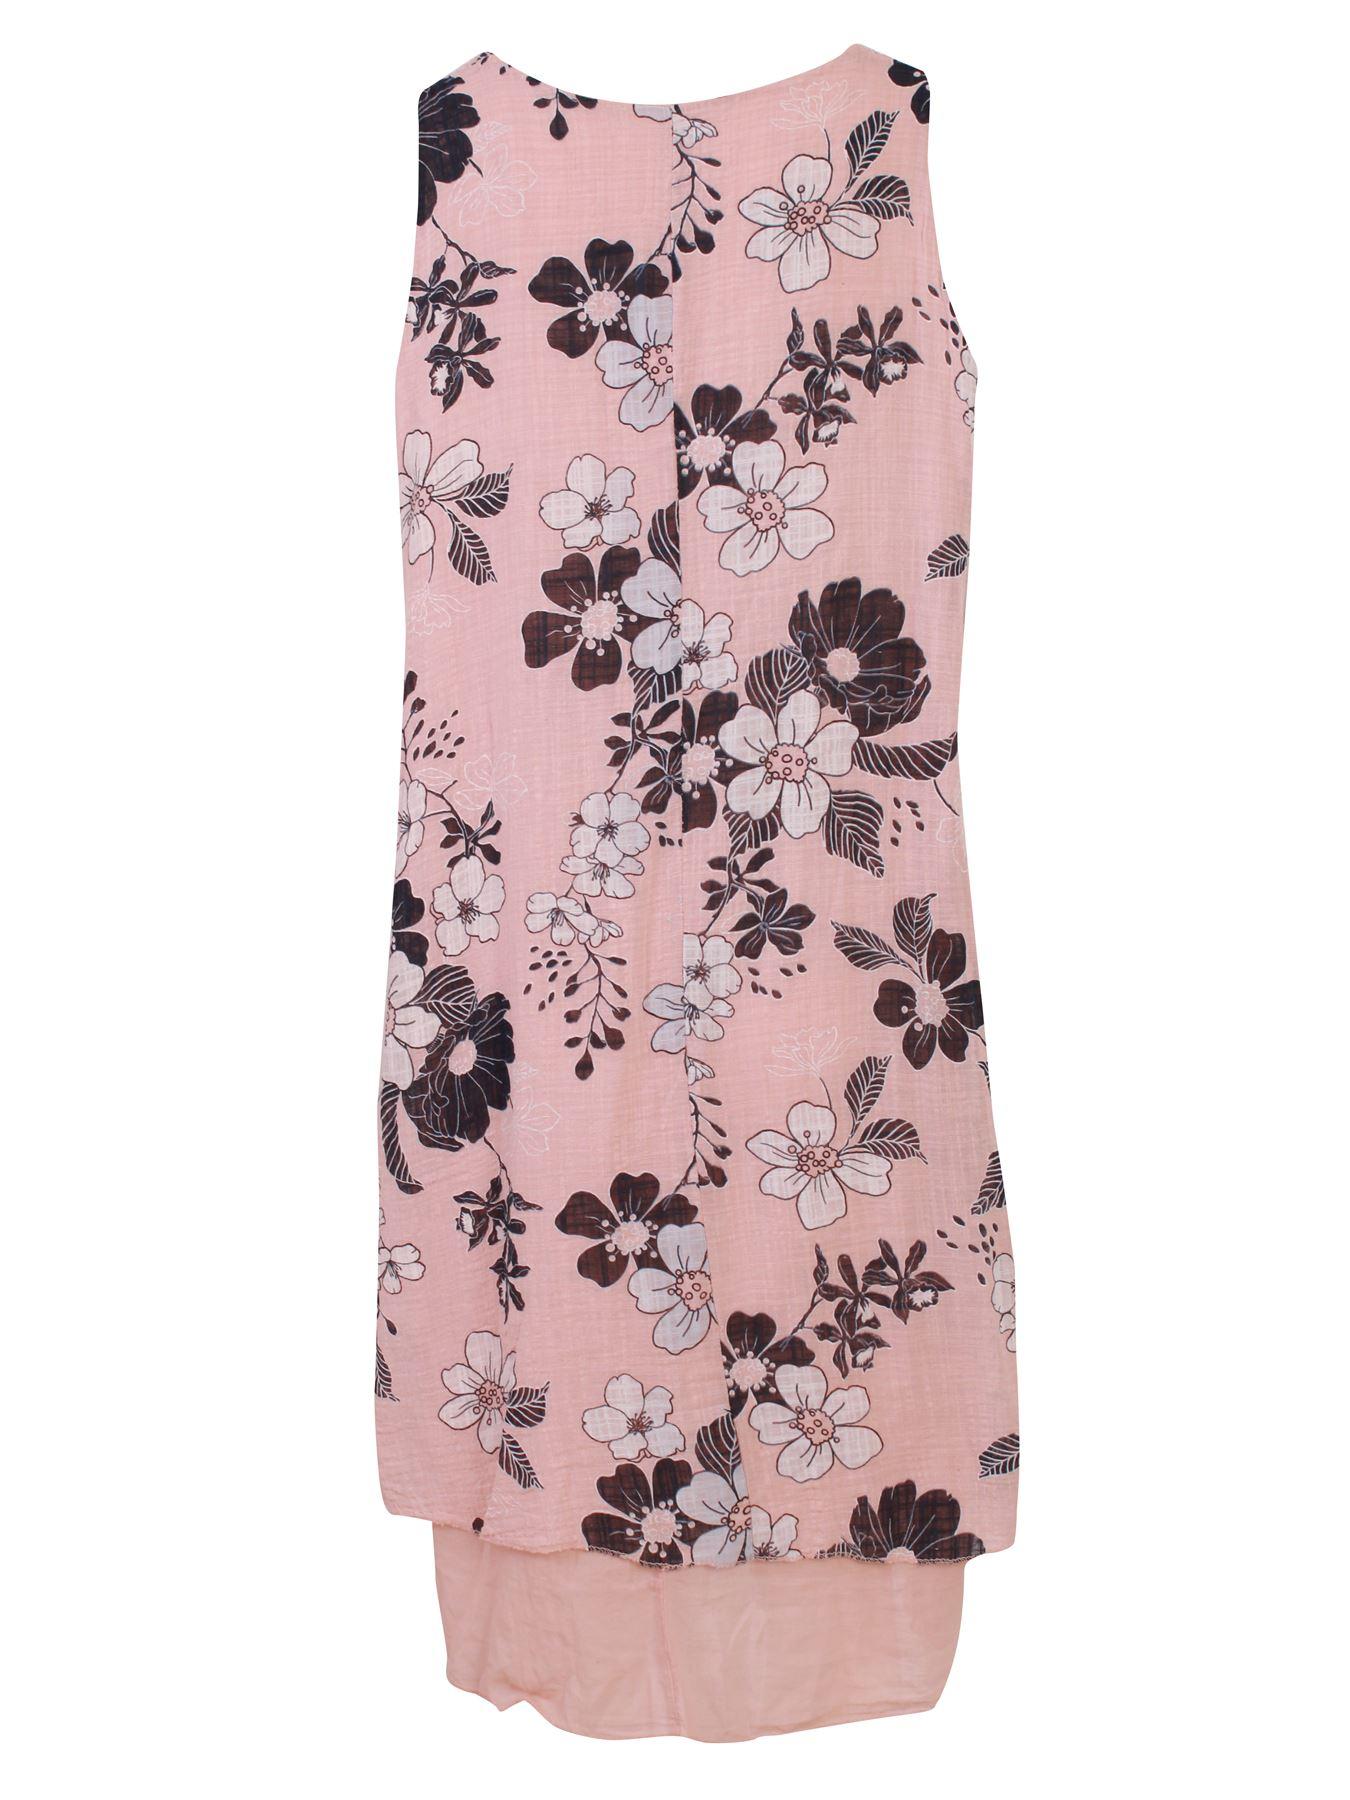 Womens-Floral-Print-Italian-Fashion-Lagenlook-Summer-Cotton-Crew-Neck-Dress thumbnail 6